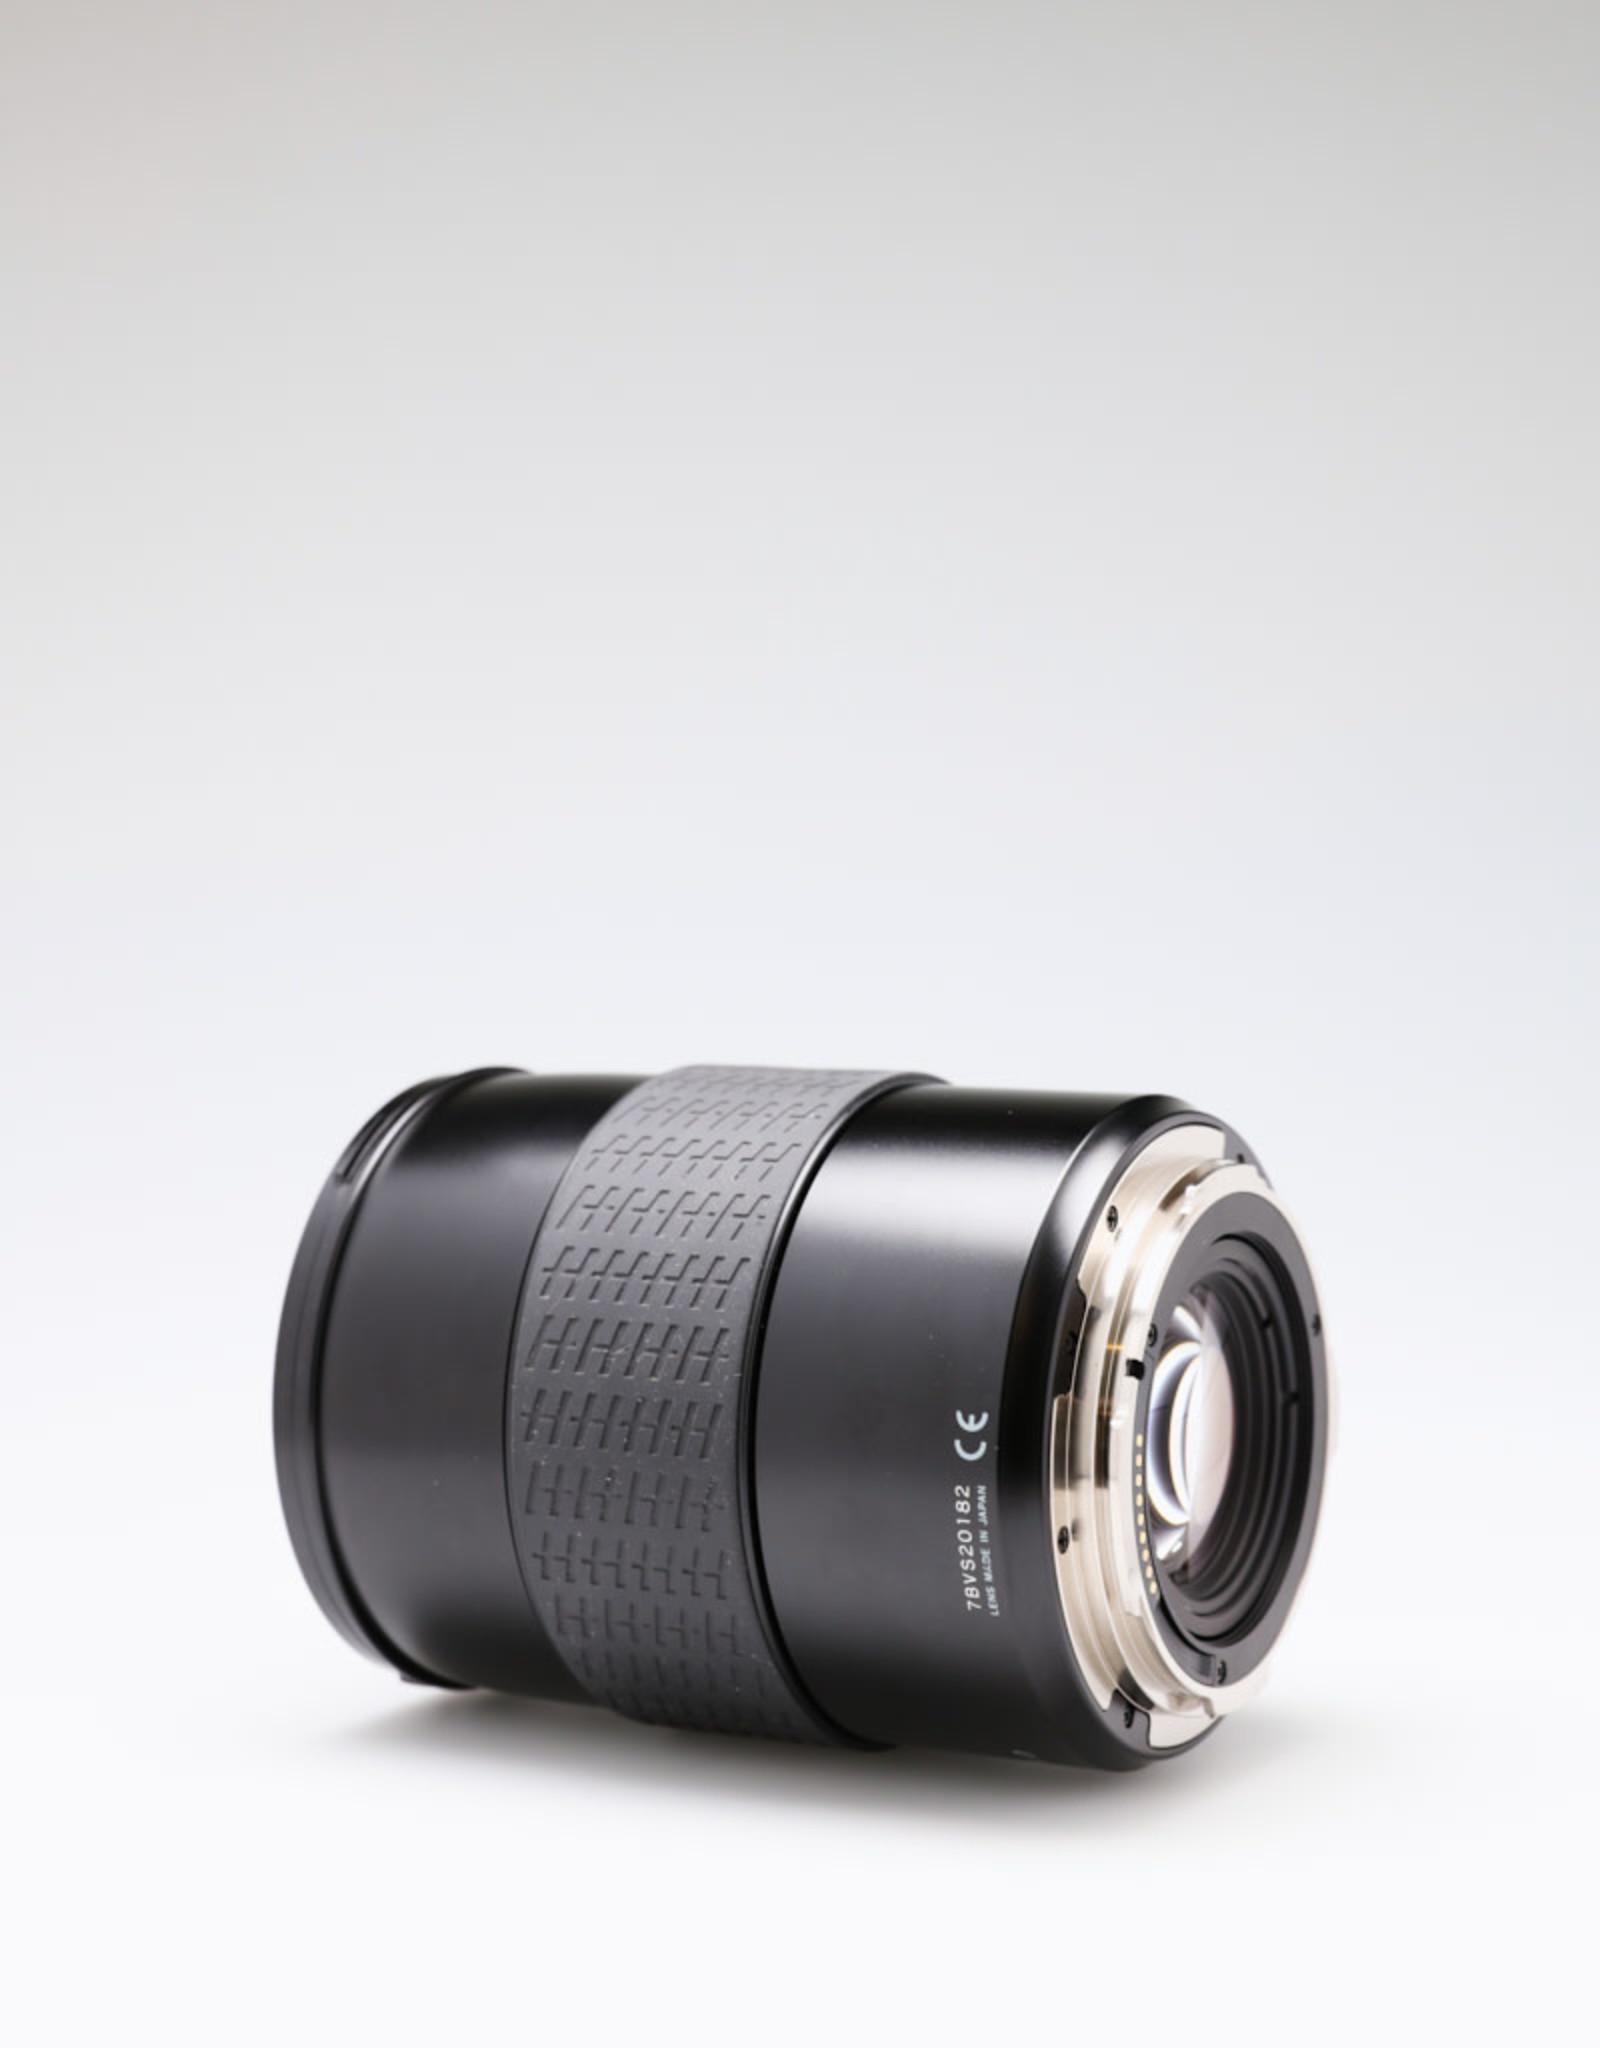 USED  Hasselblad HC 50mm II F3.5 Lens